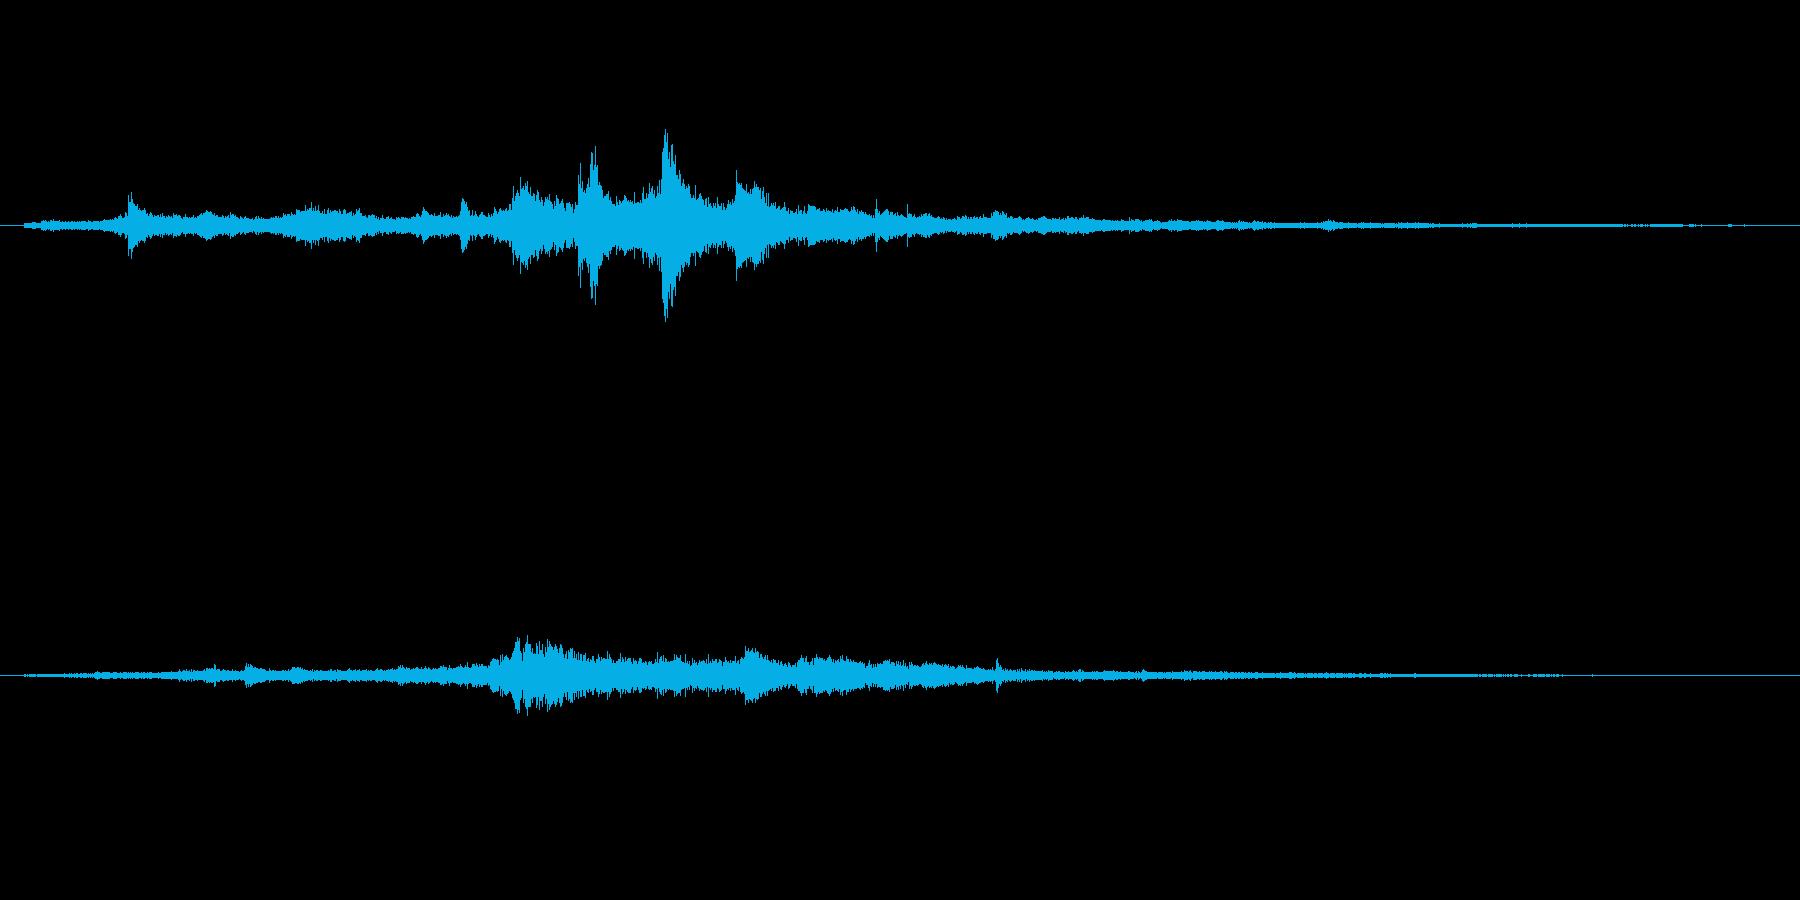 【SE 効果音】奇妙な音11の再生済みの波形